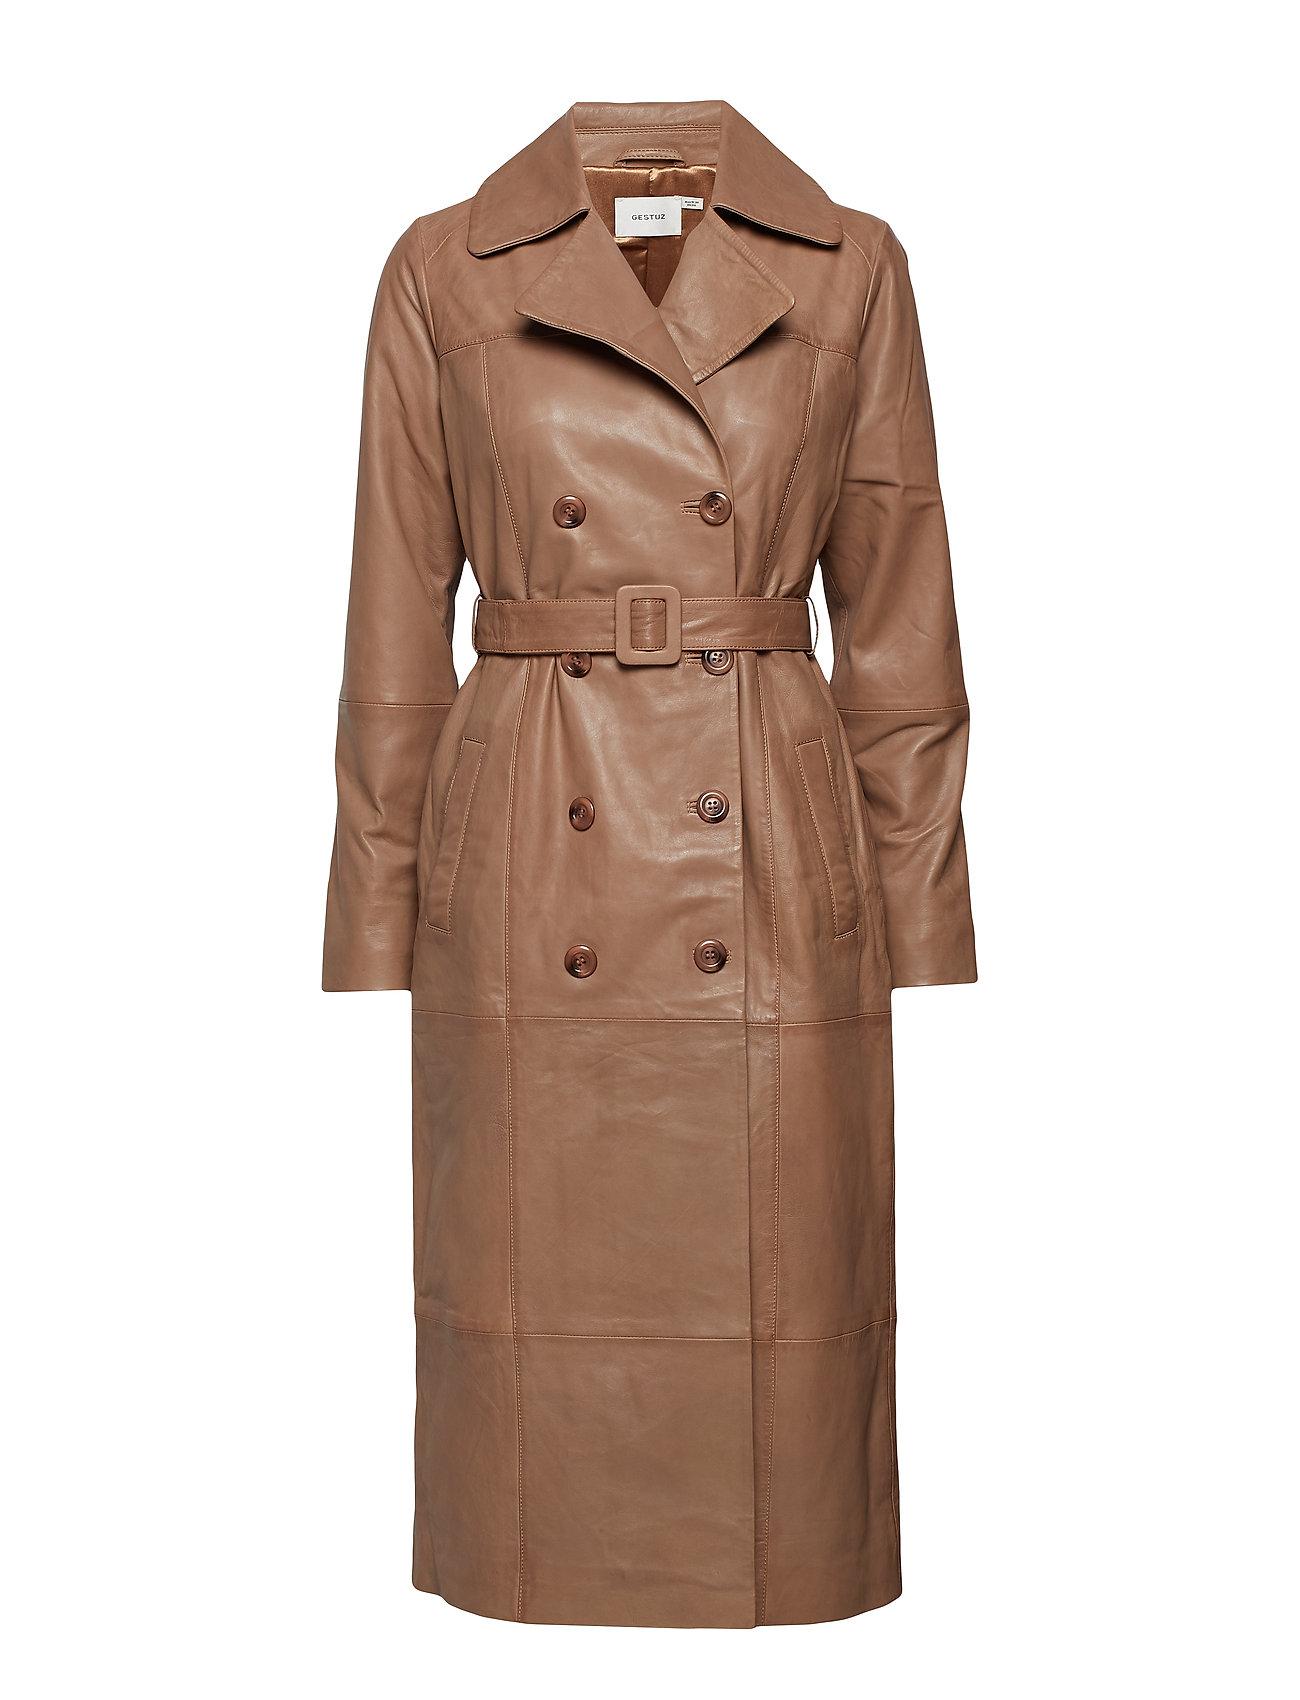 Gestuz Ysabel coat SO19 - PORTABELLA